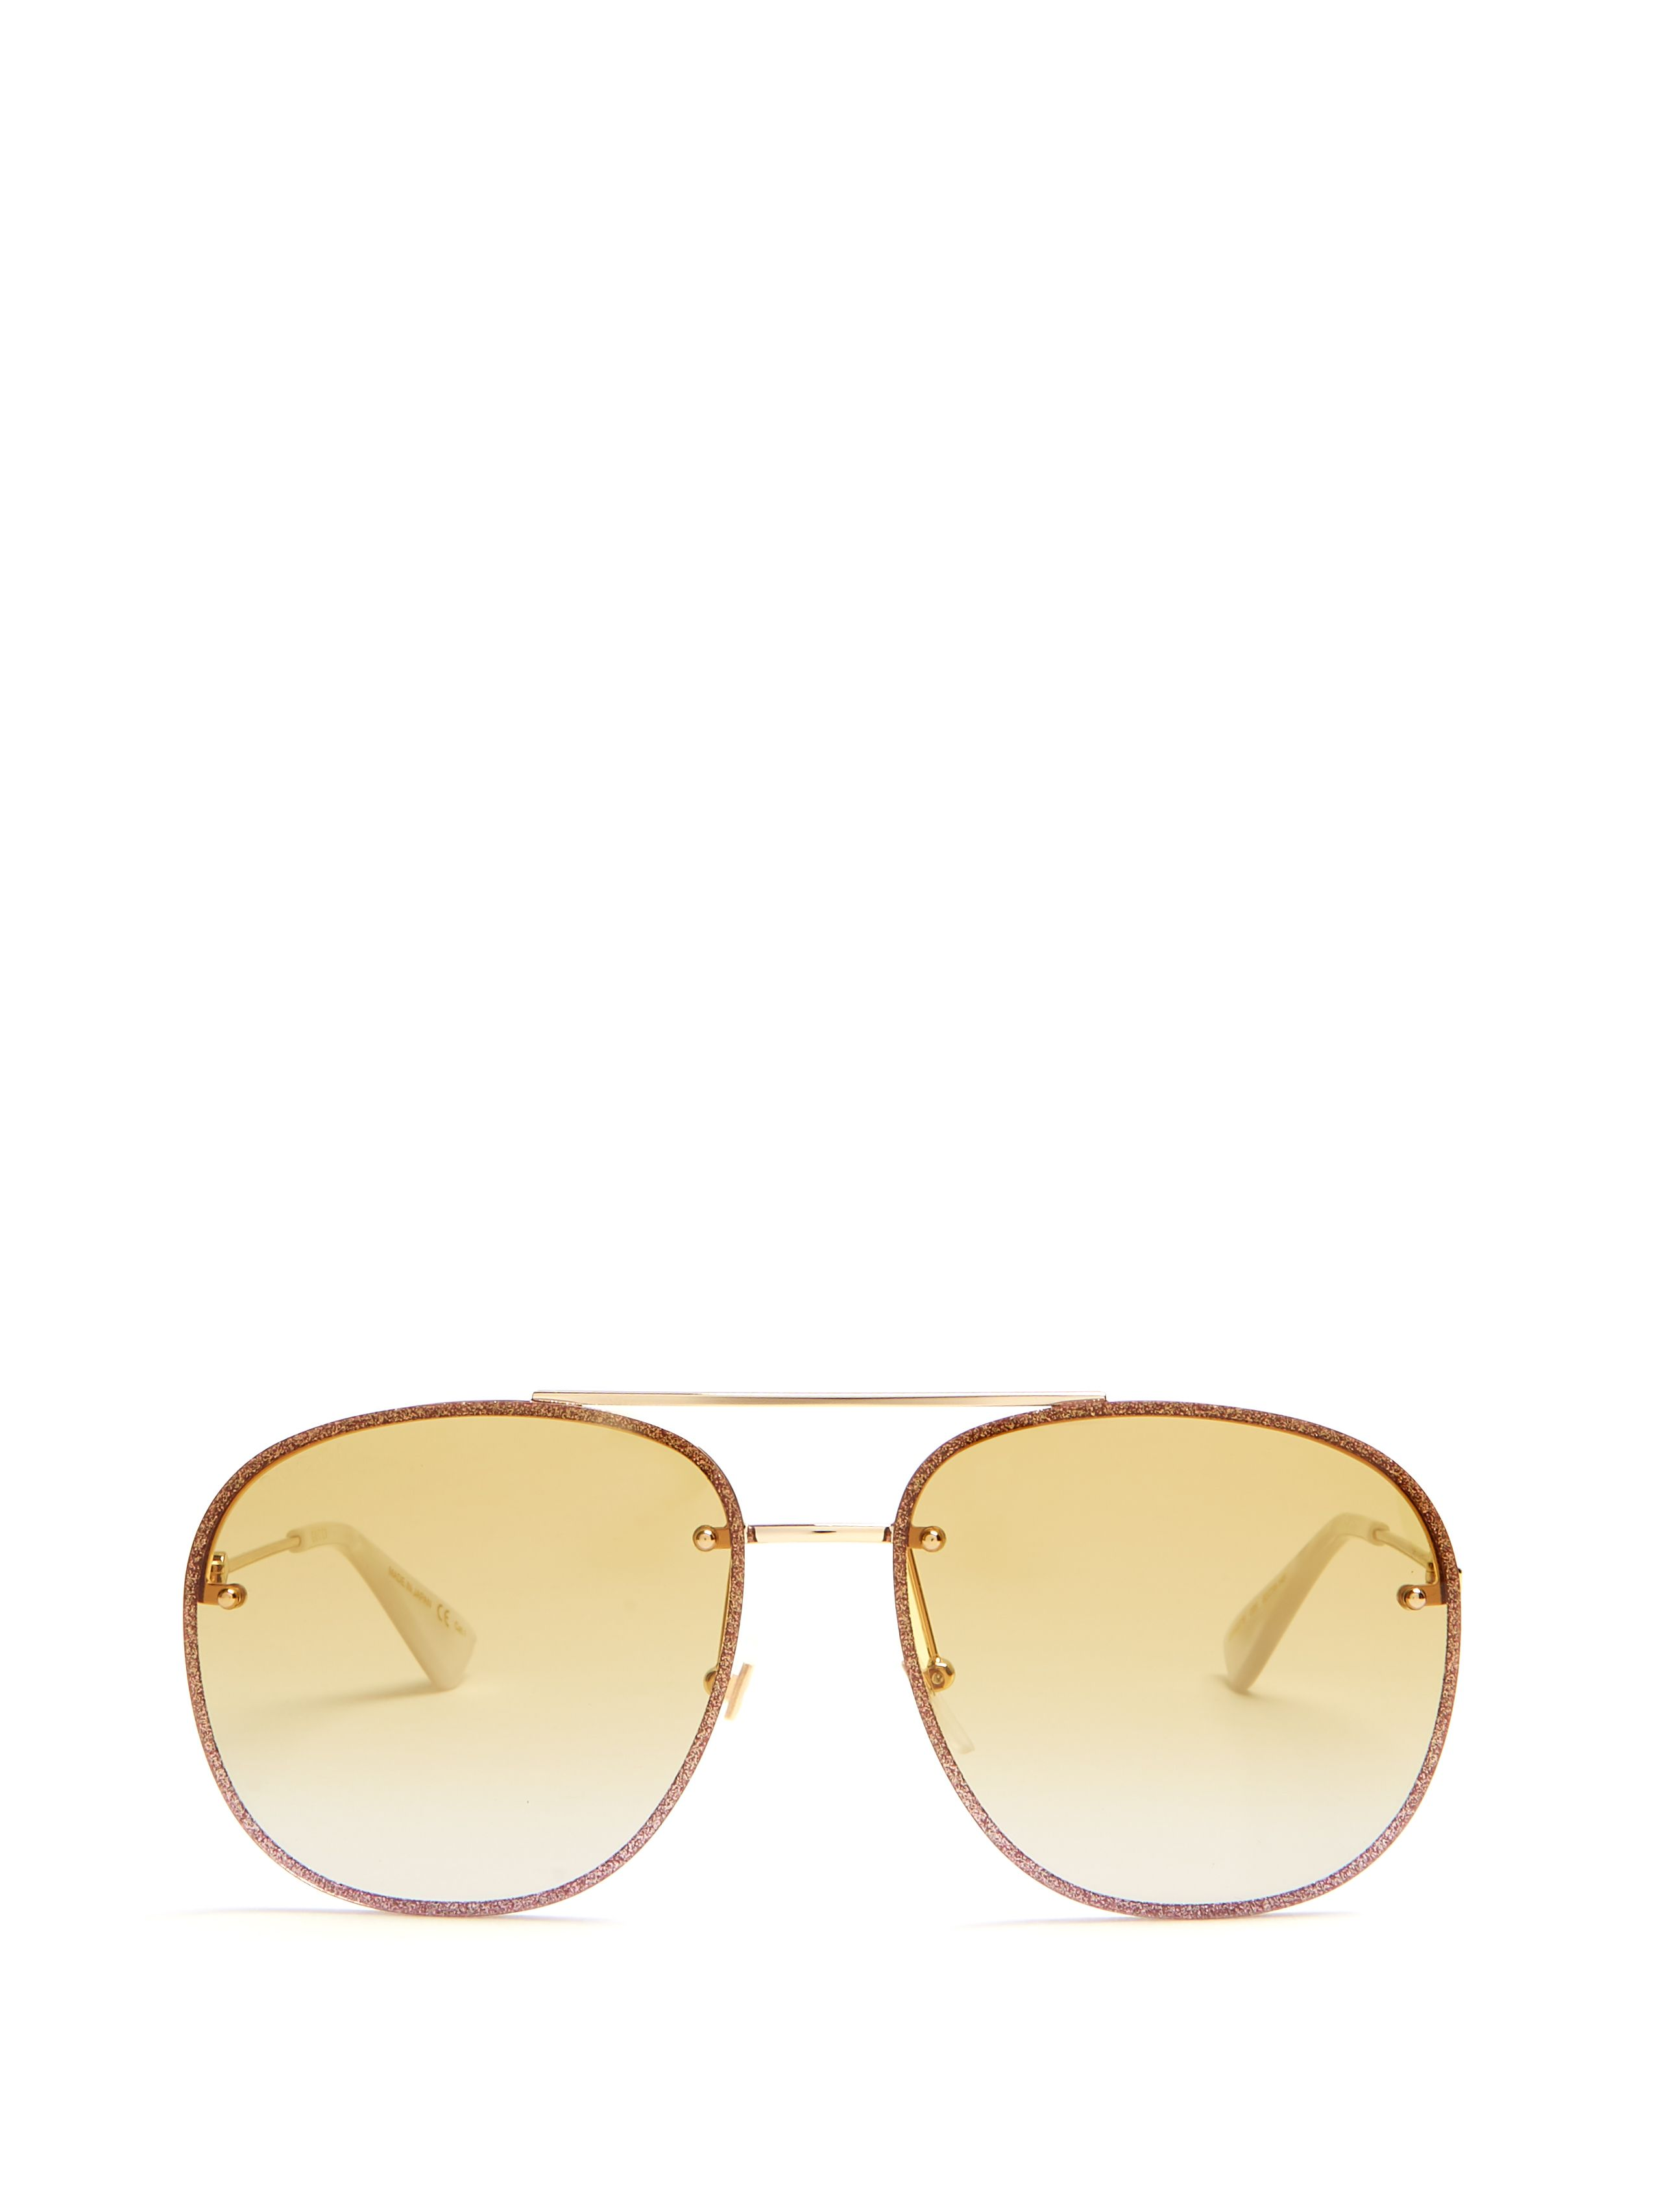 d58020673e2 GUCCI GLITTER-EMBELLISHED AVIATOR SUNGLASSES.  gucci   Buy Gucci